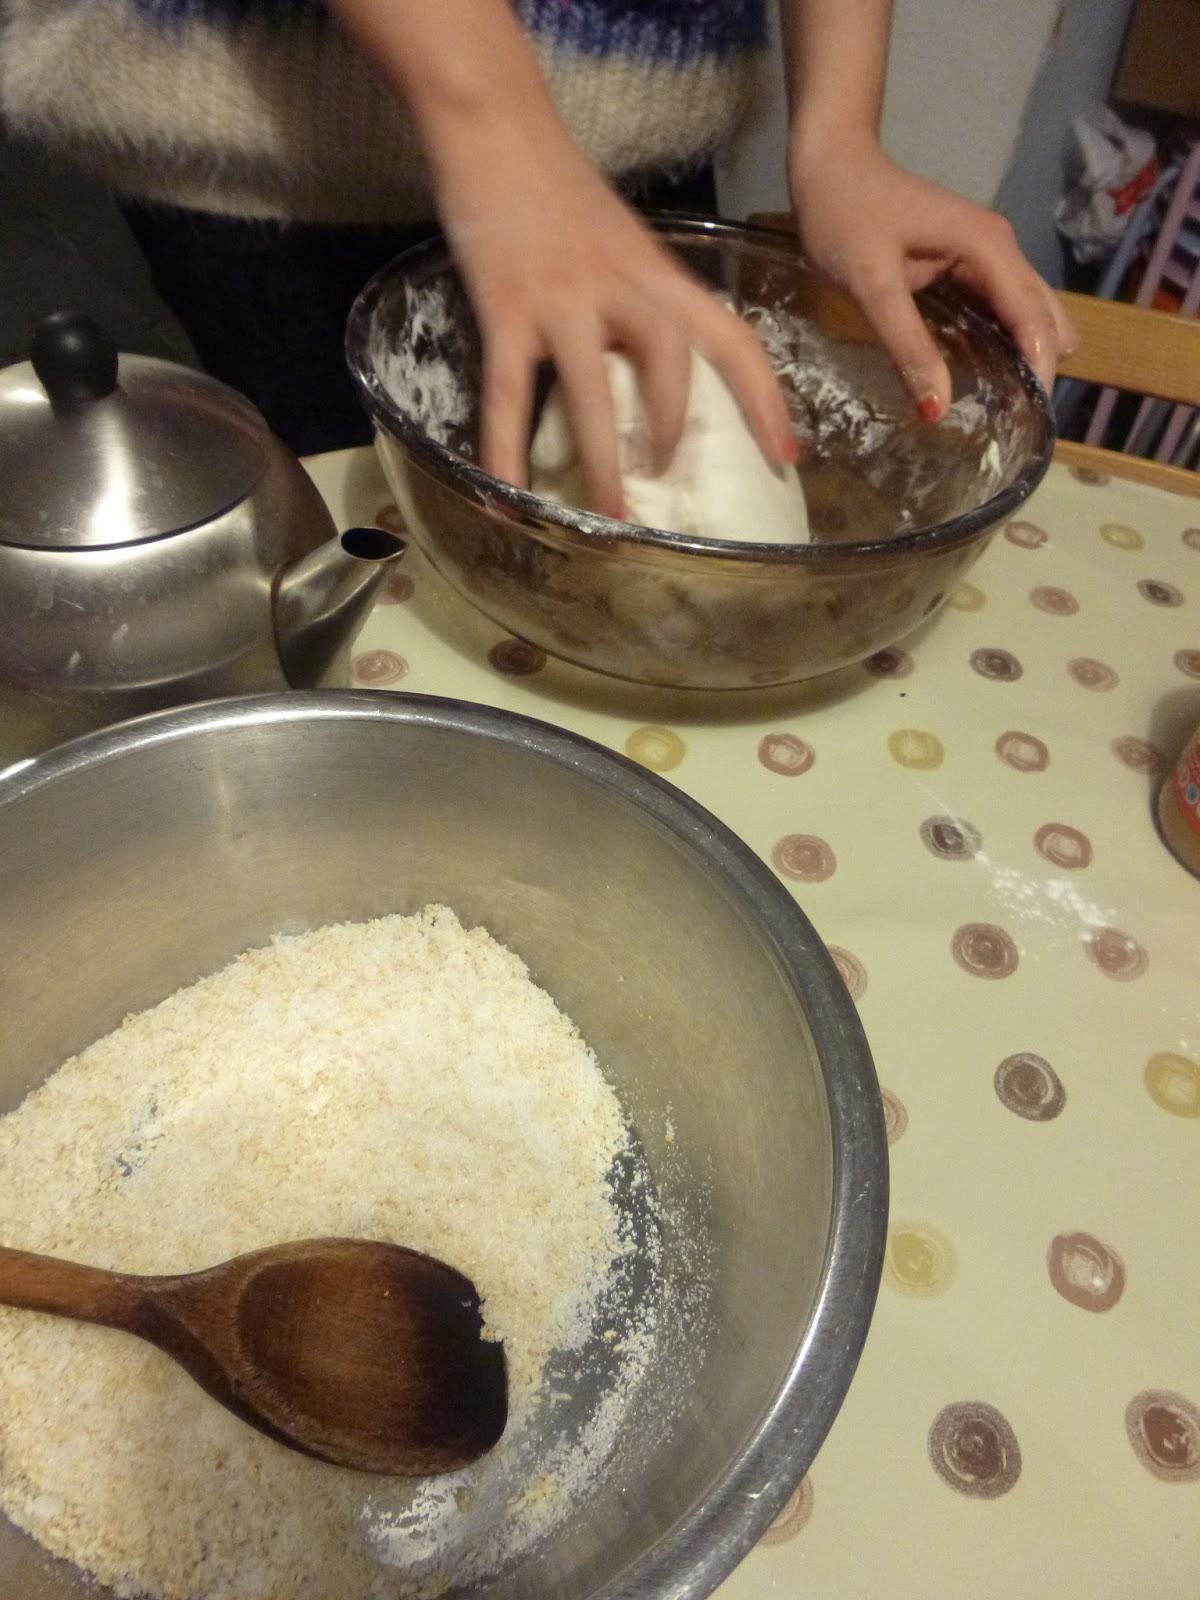 how to make dumplings not stick